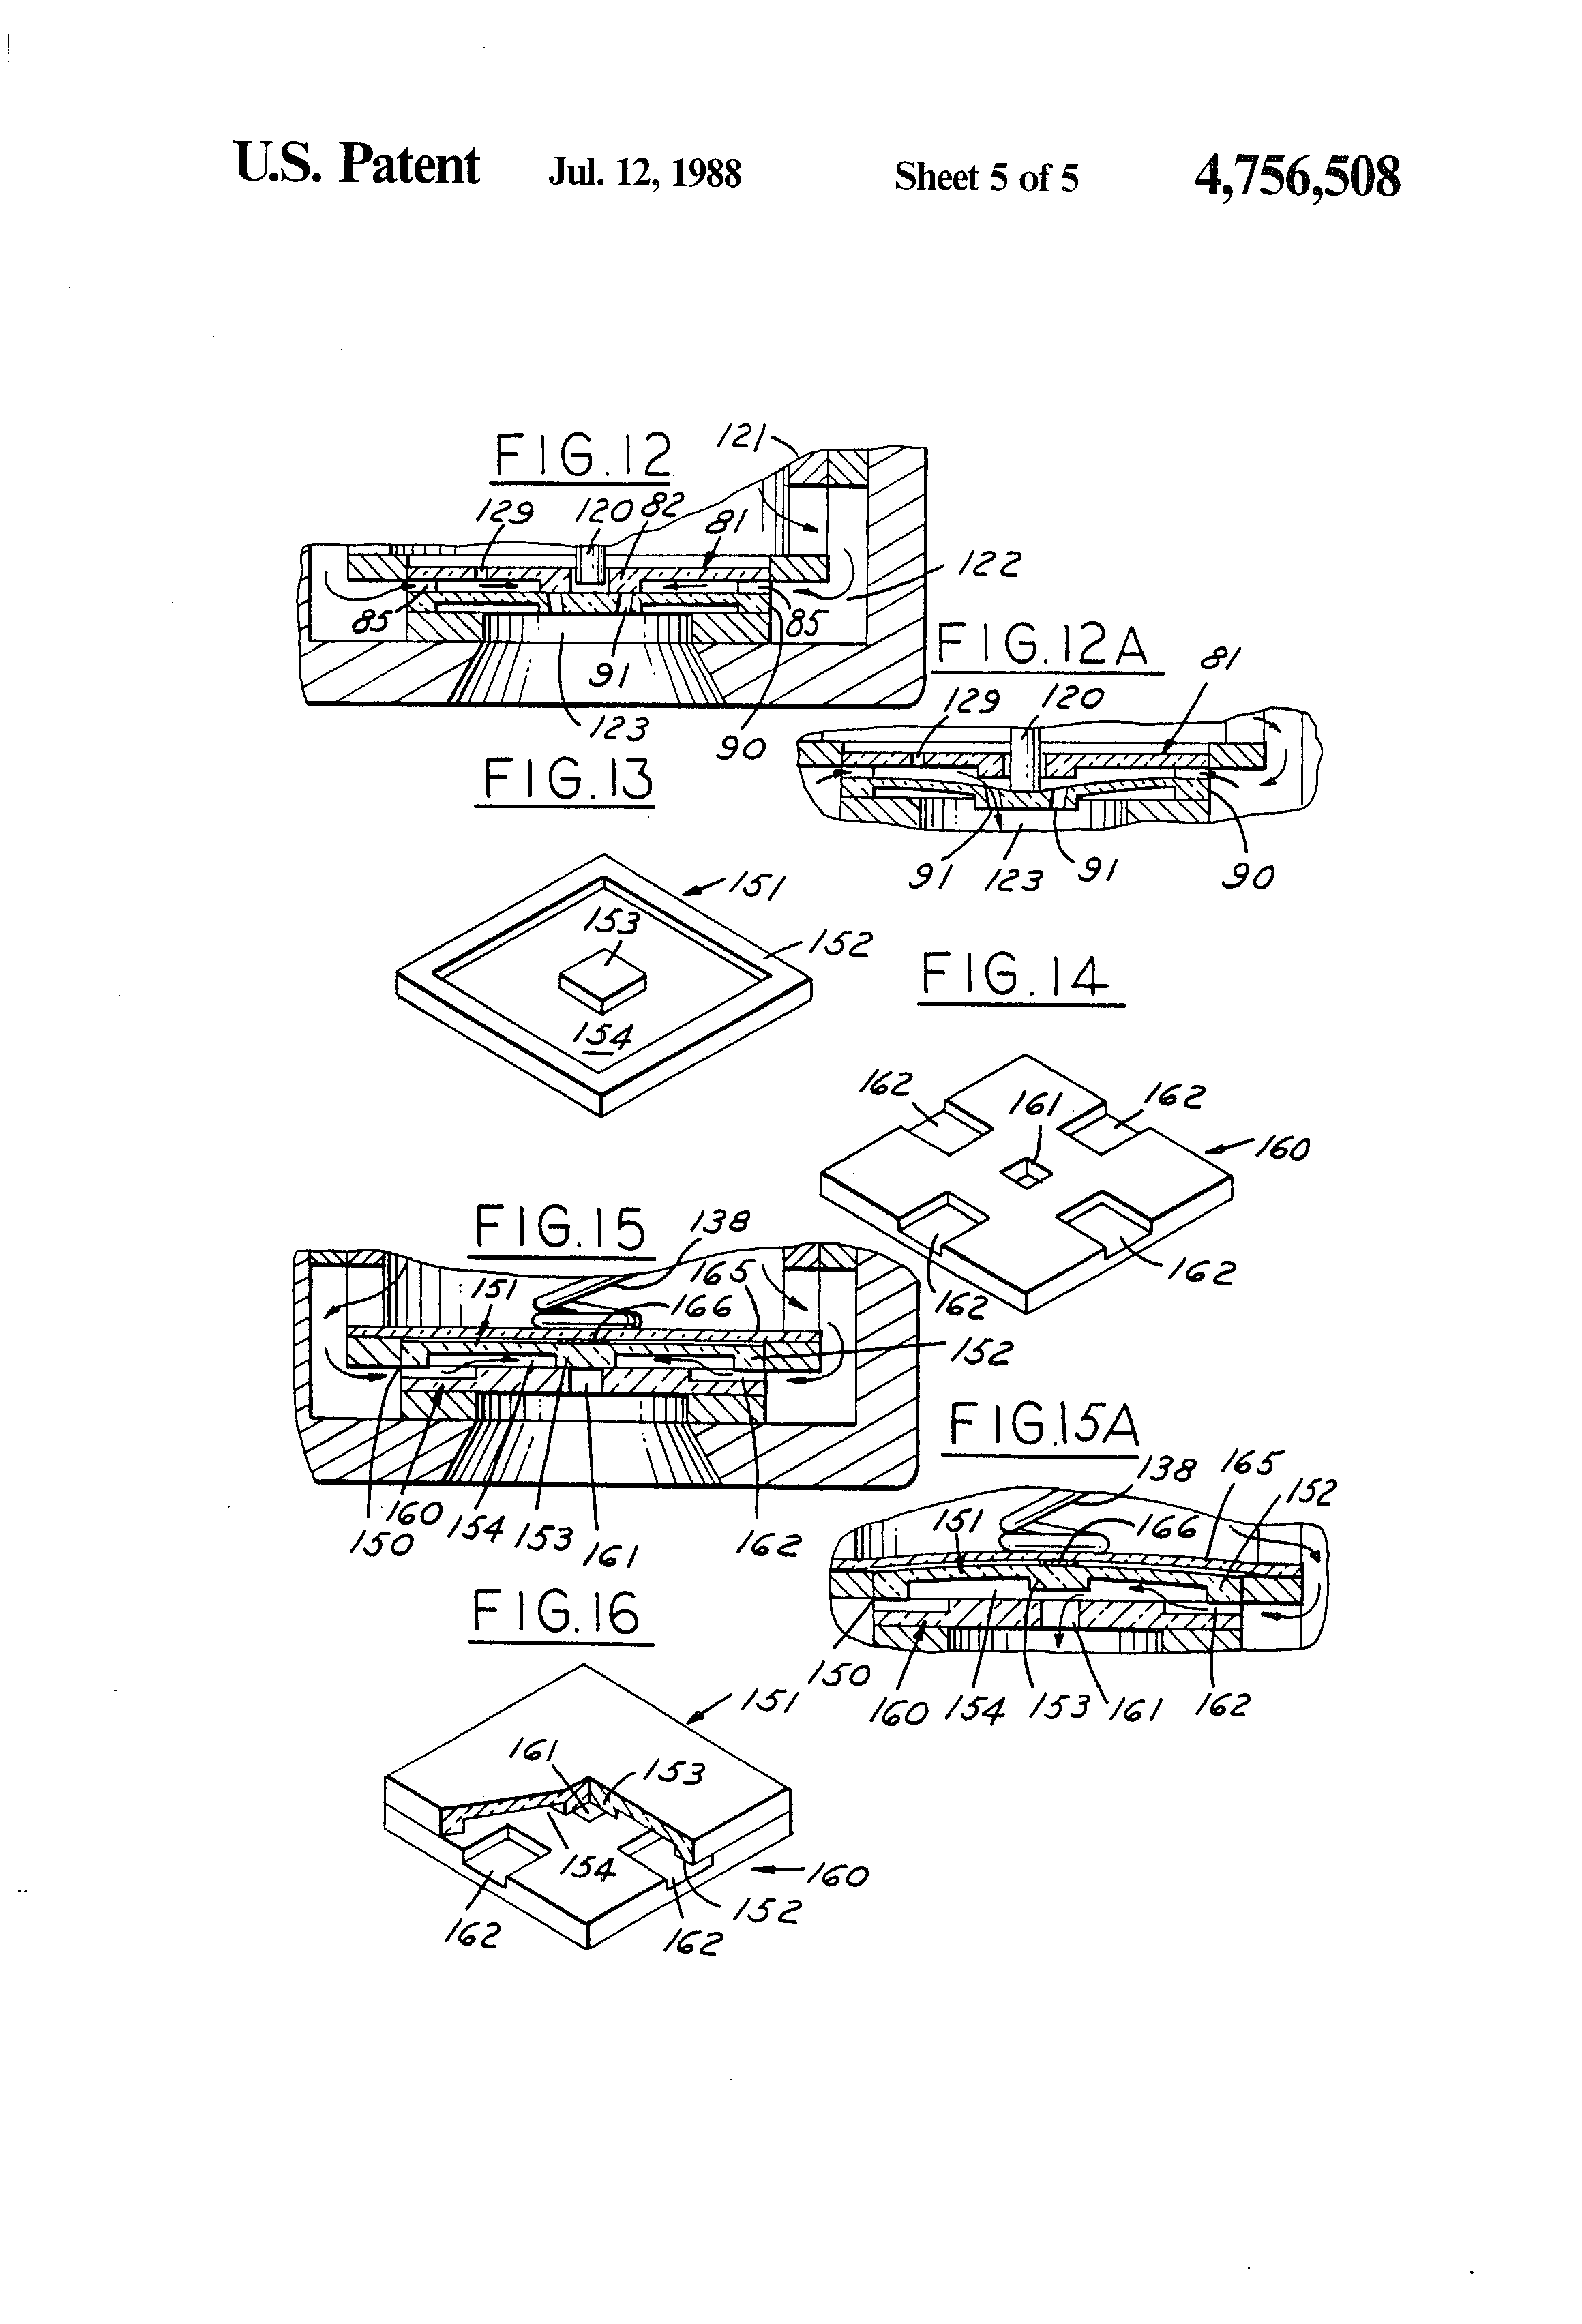 """Silicon Valve""   Patent number 4,756,508     Filing date: Nov 13,1986, Issue date: Jul 12, 1988 Inventors Joseph M. Giachino, James W. Kress"